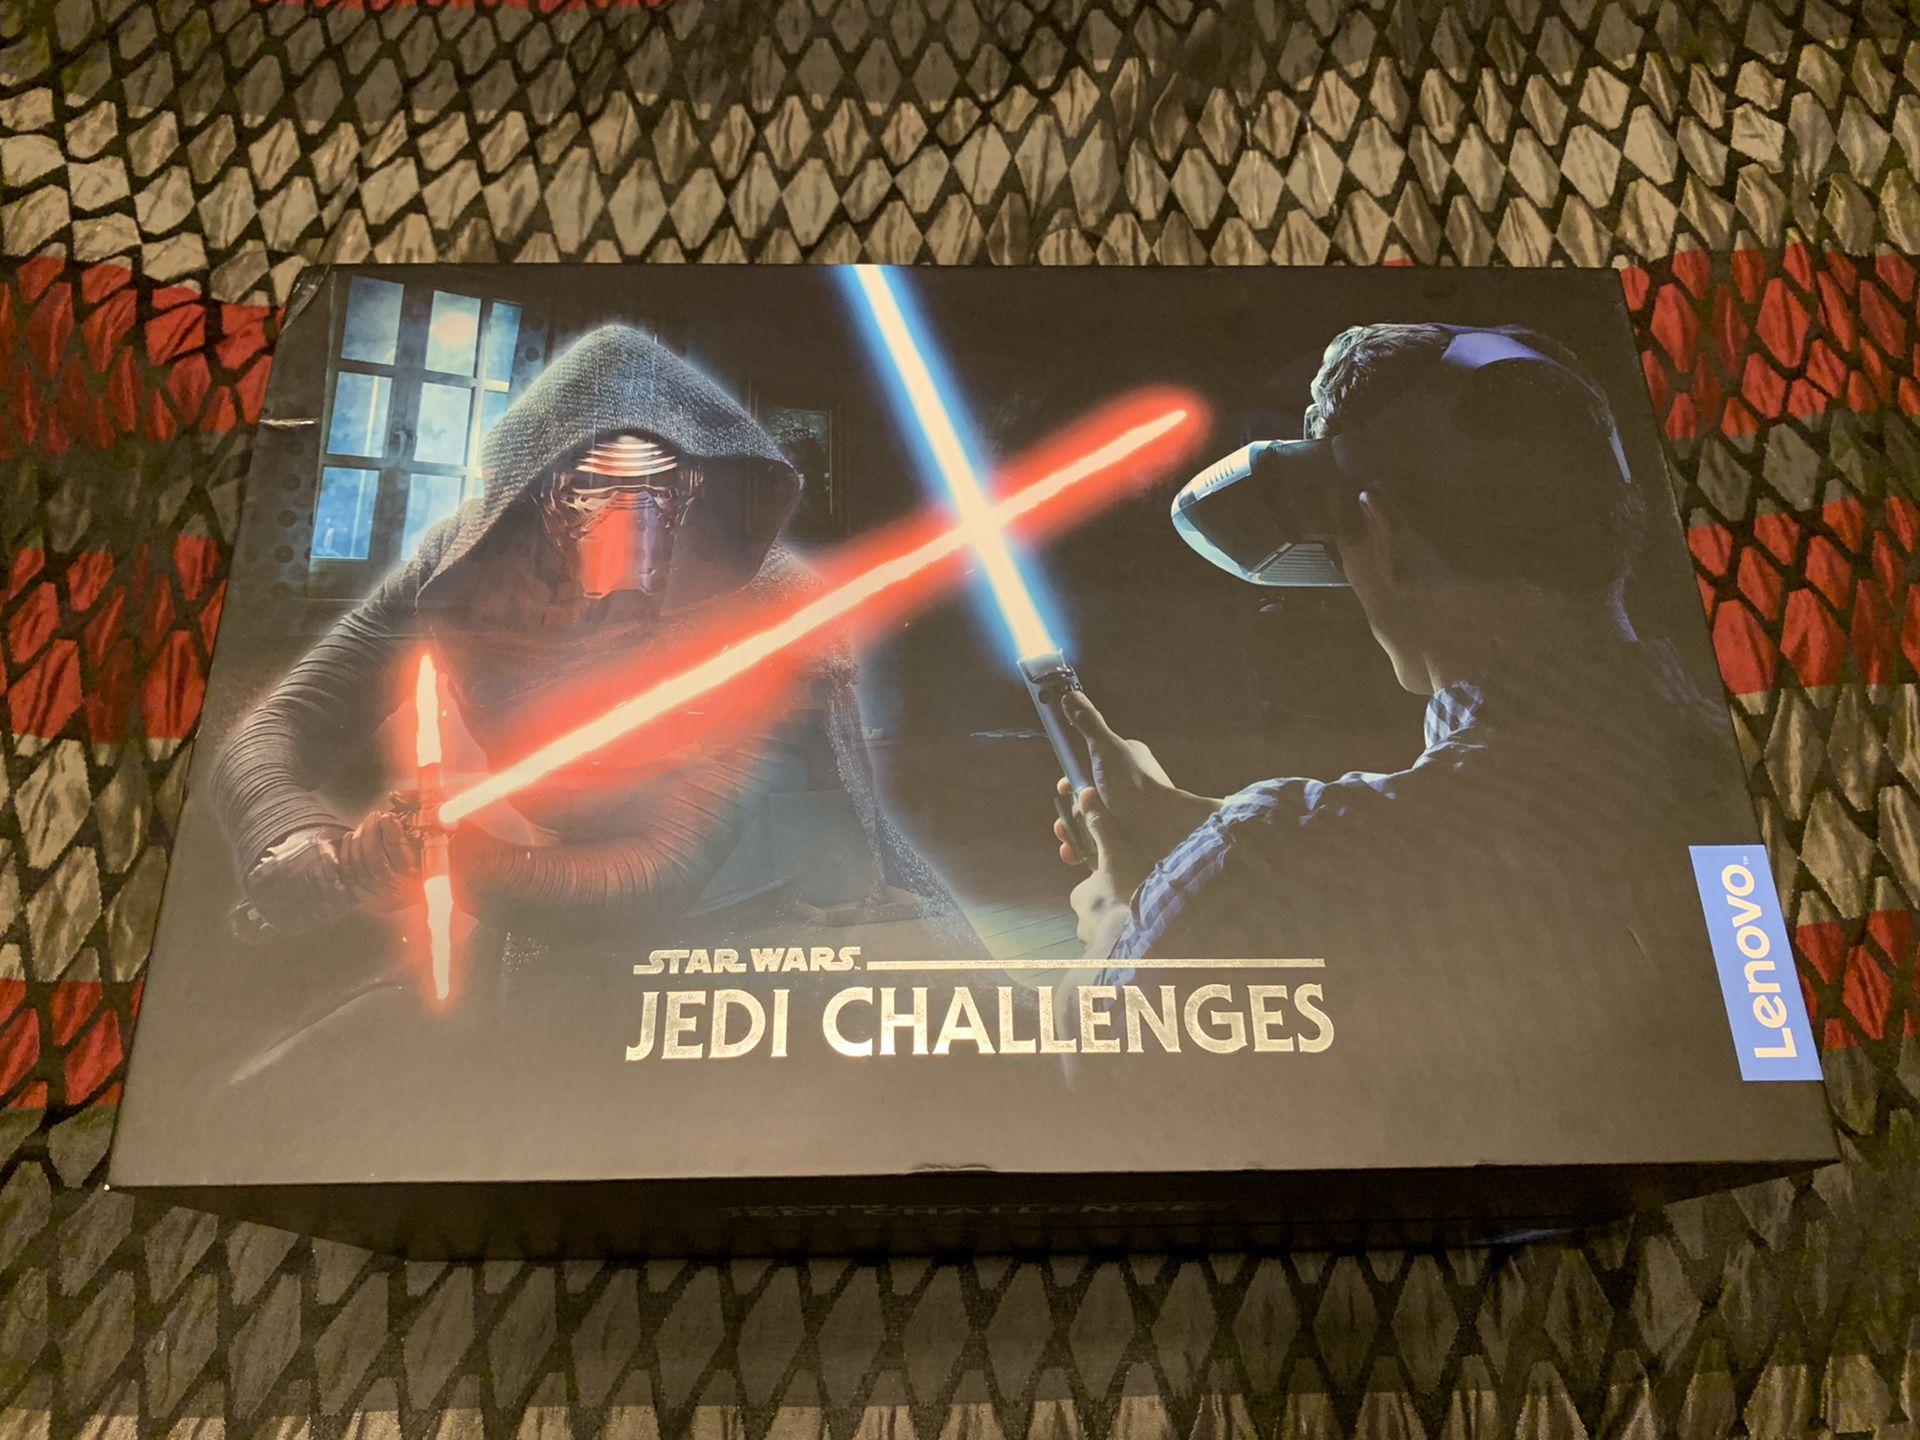 Star Wars Jedi Challenges VR set for iPhone